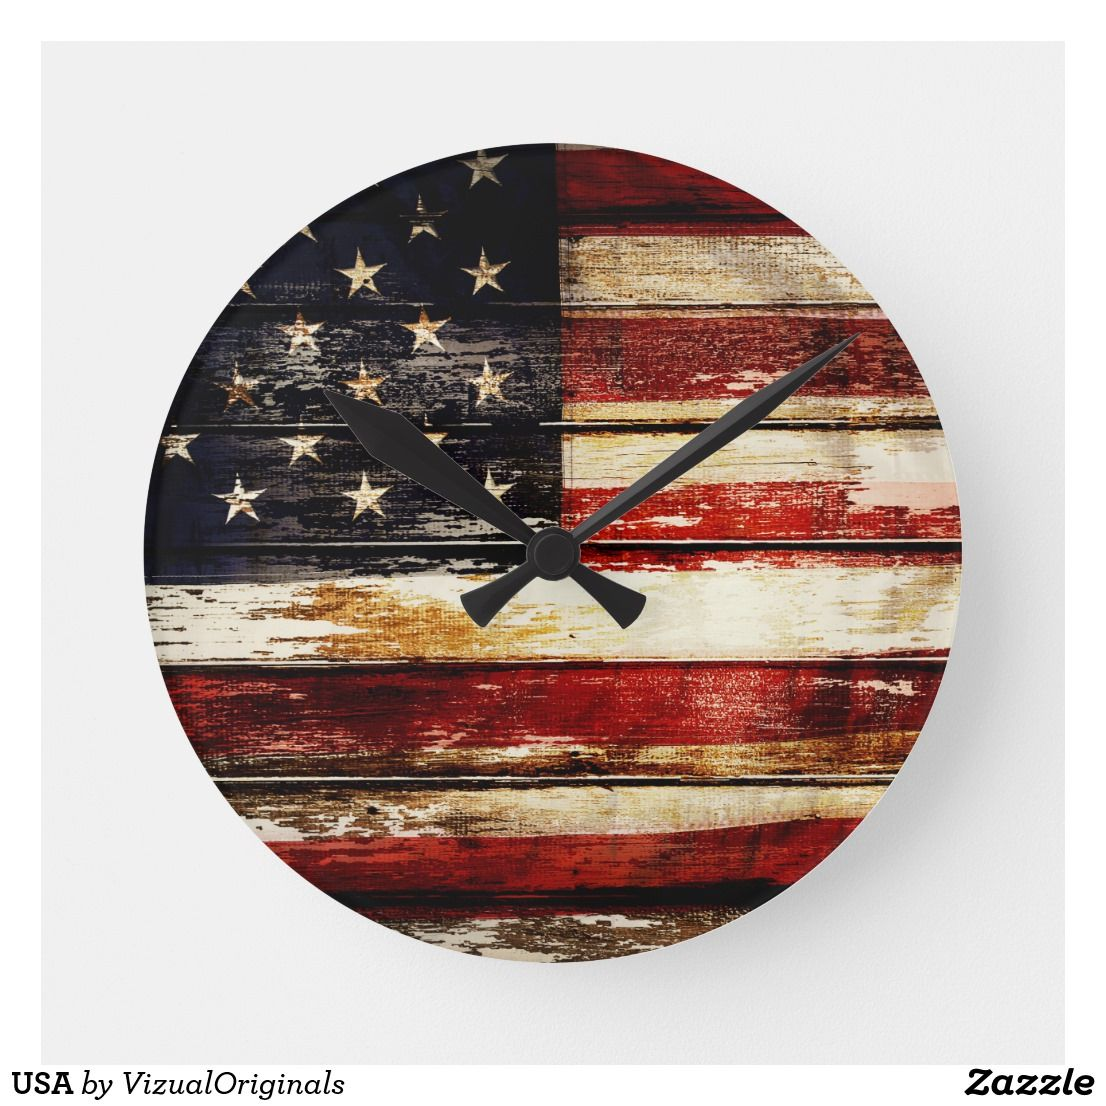 USA ROUND CLOCK Clock, Primitive wood signs